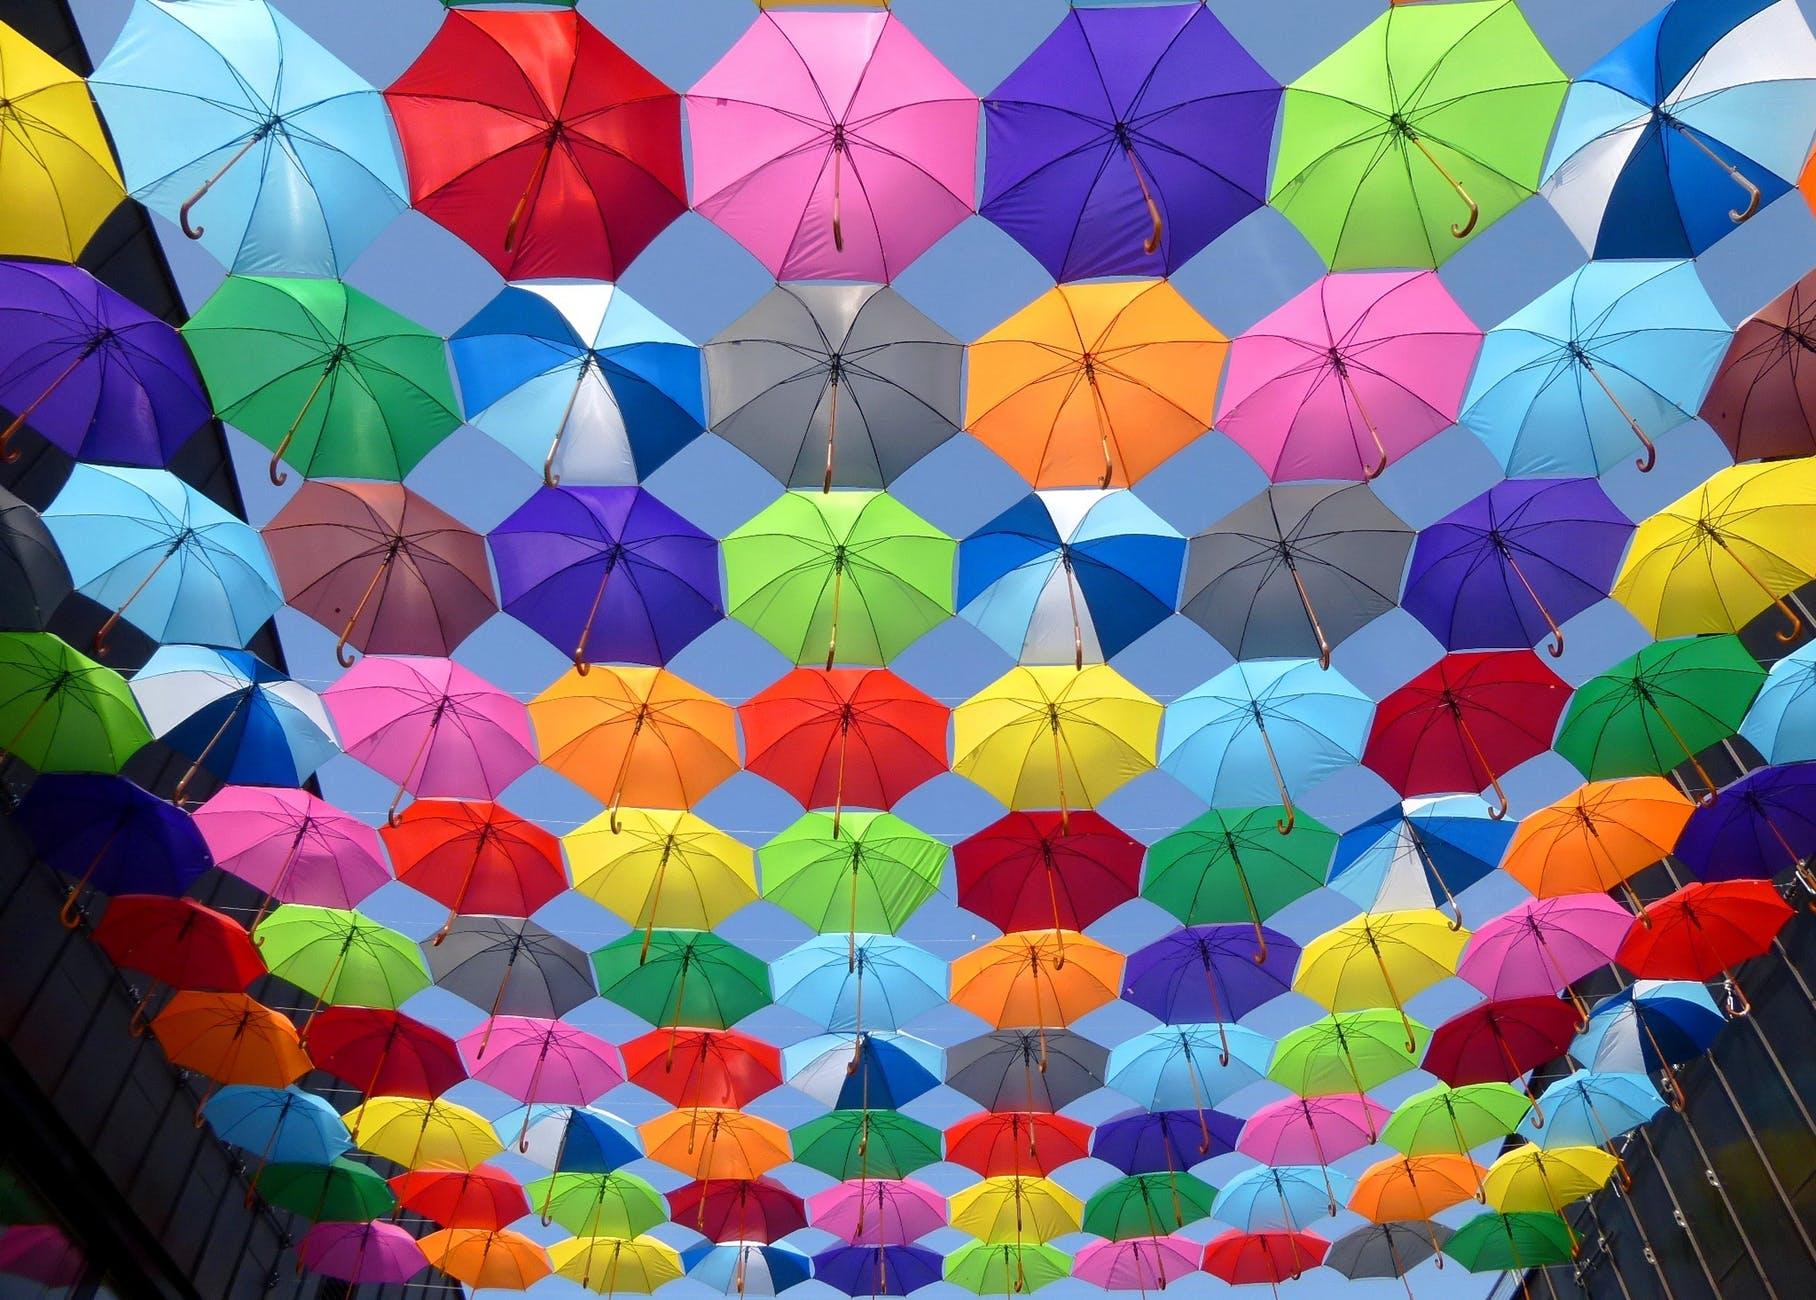 Fargerike paraplyer i luften